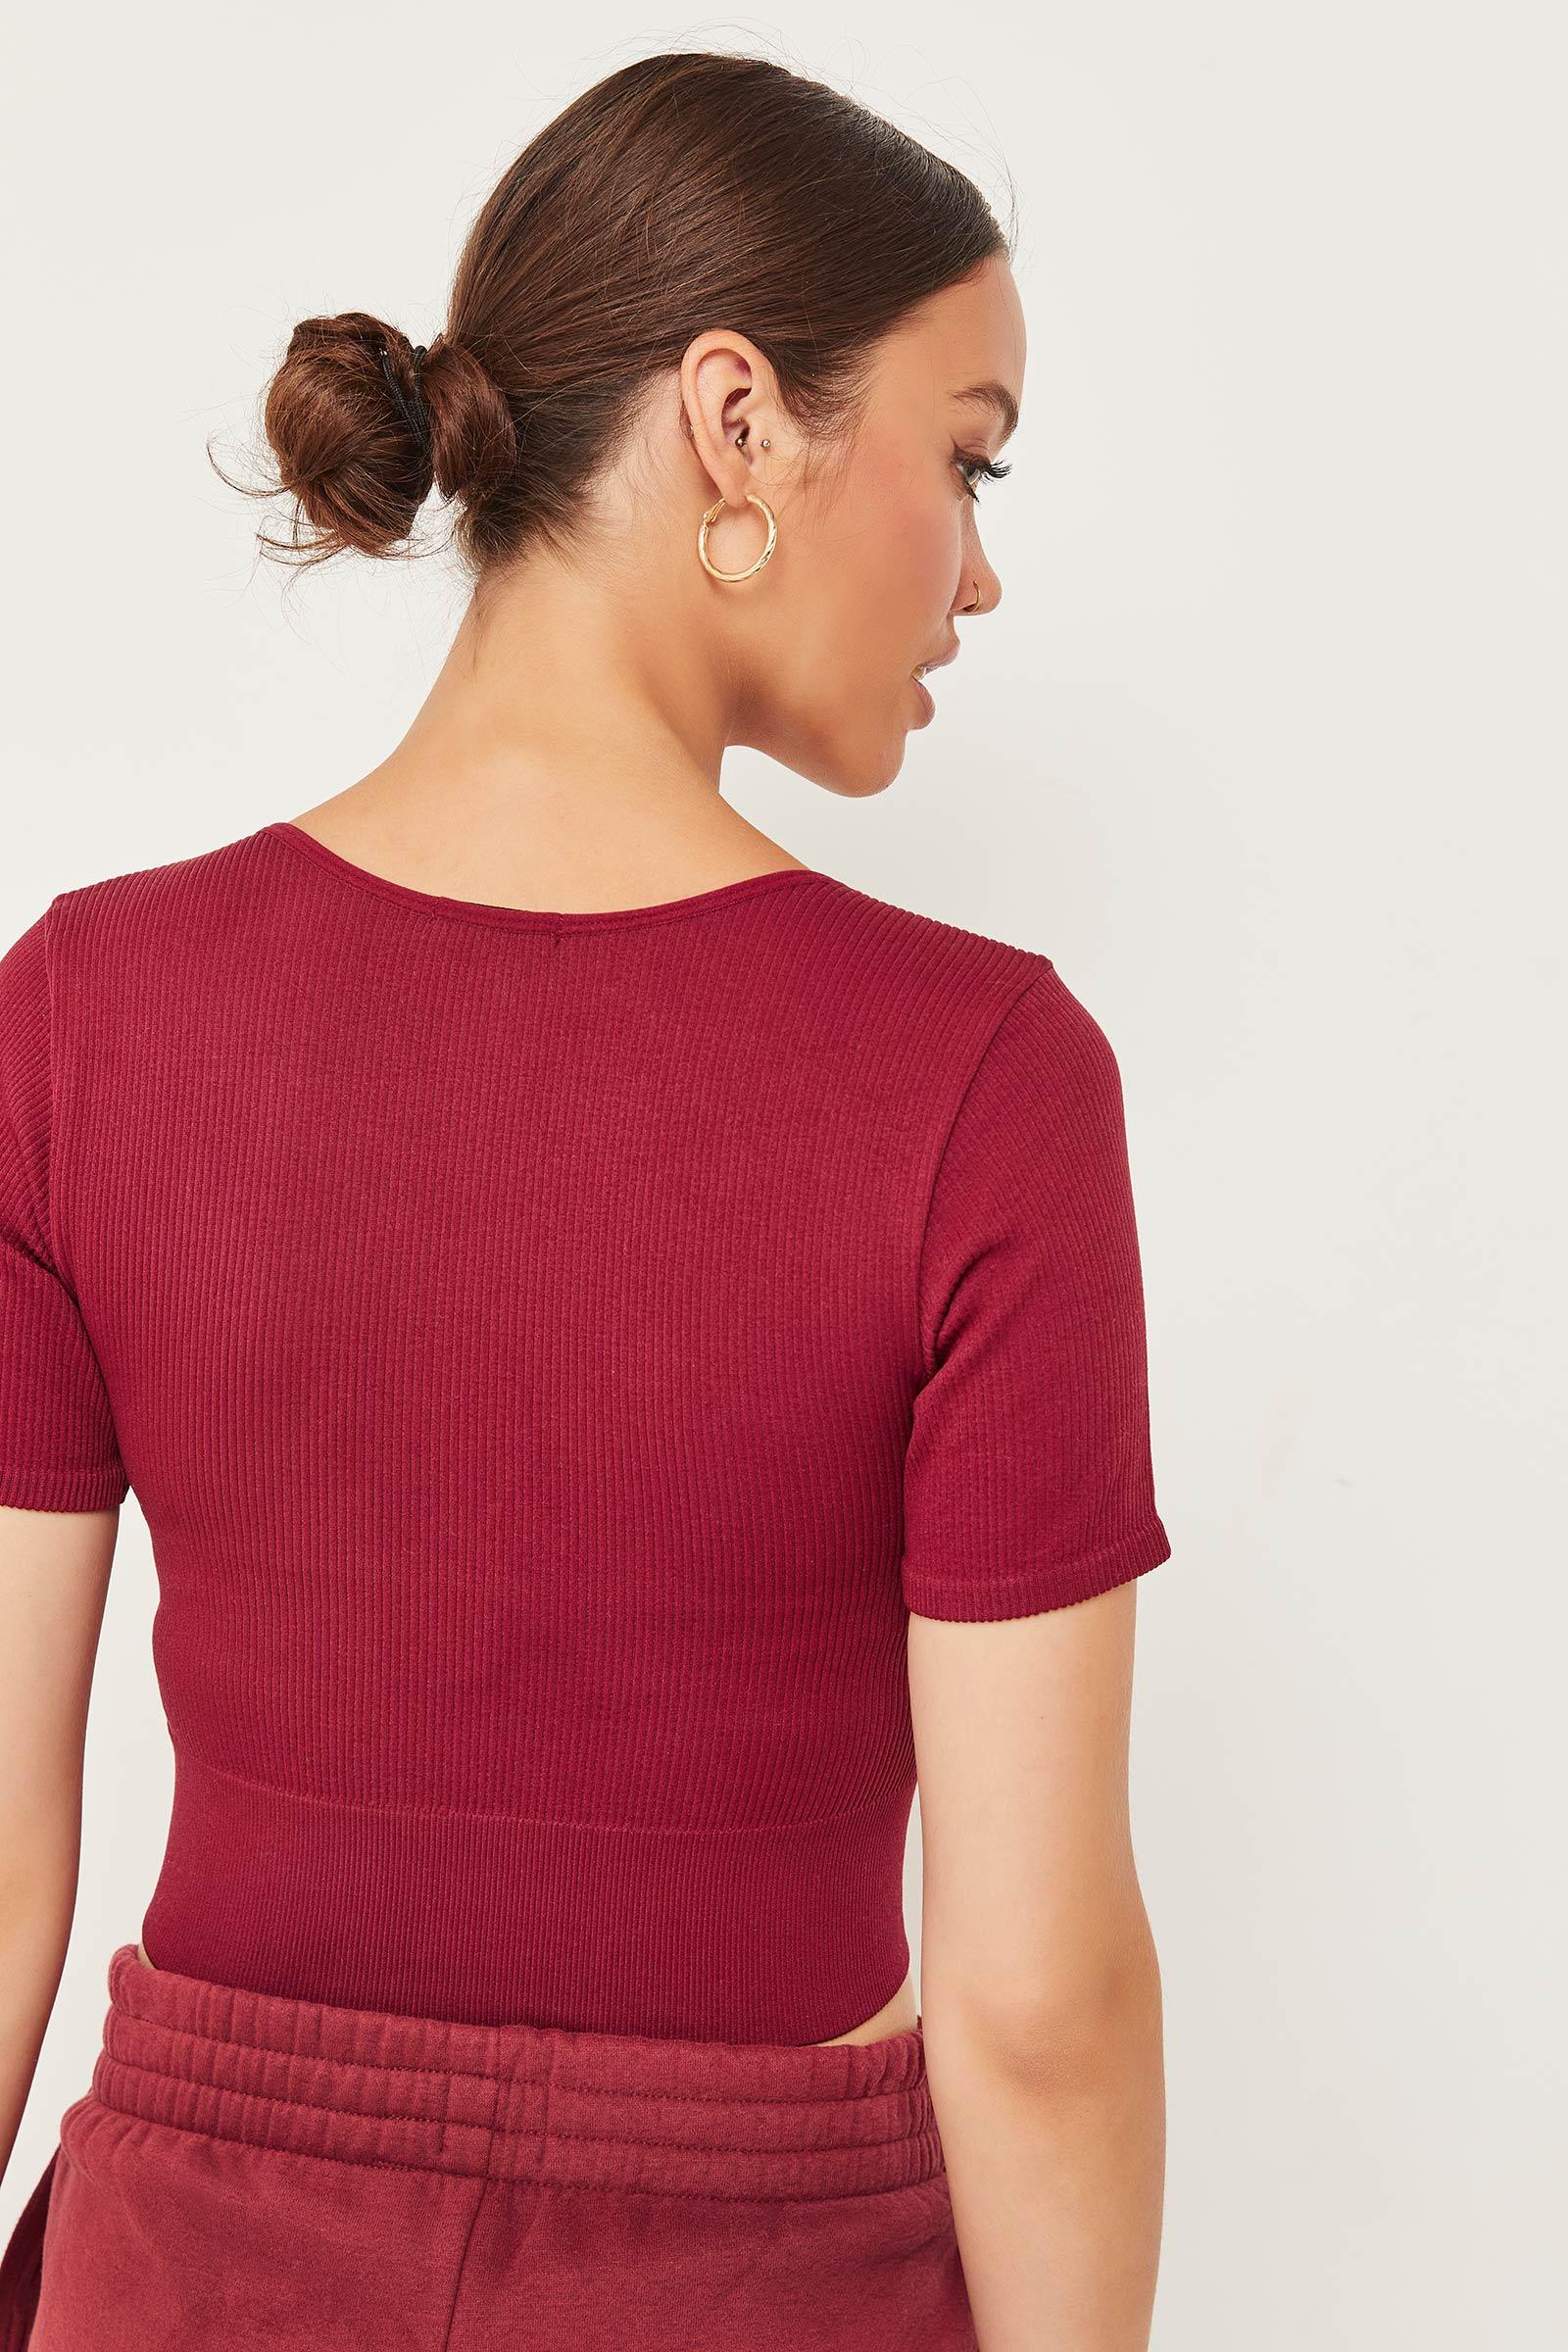 T-shirt ultracourt sans coutures